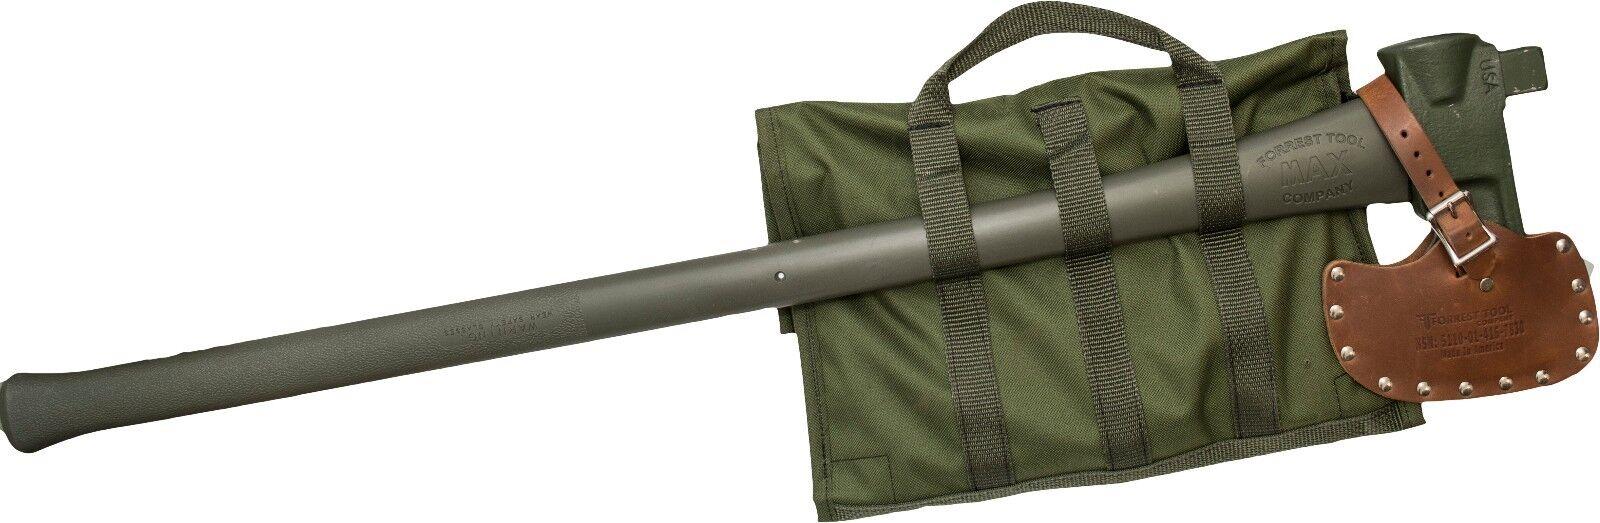 The MAX Military Multi Purpose Tool cheap wholesale